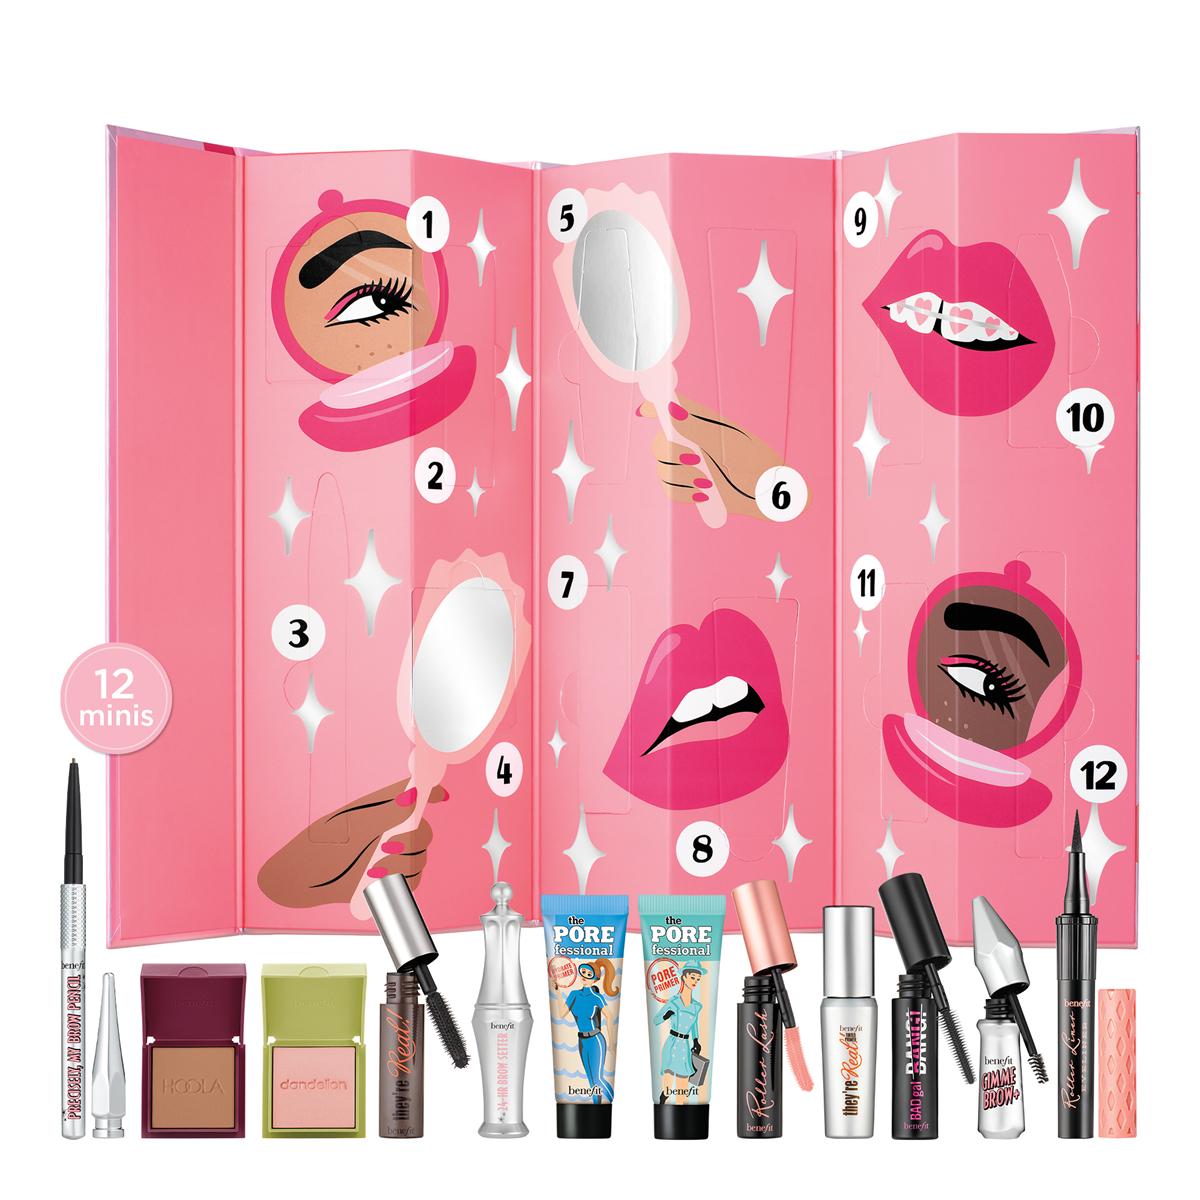 Benefit Shake Your Beauty Advent Calendar plus free gift £58.50 Benefit Cosmetics Shop